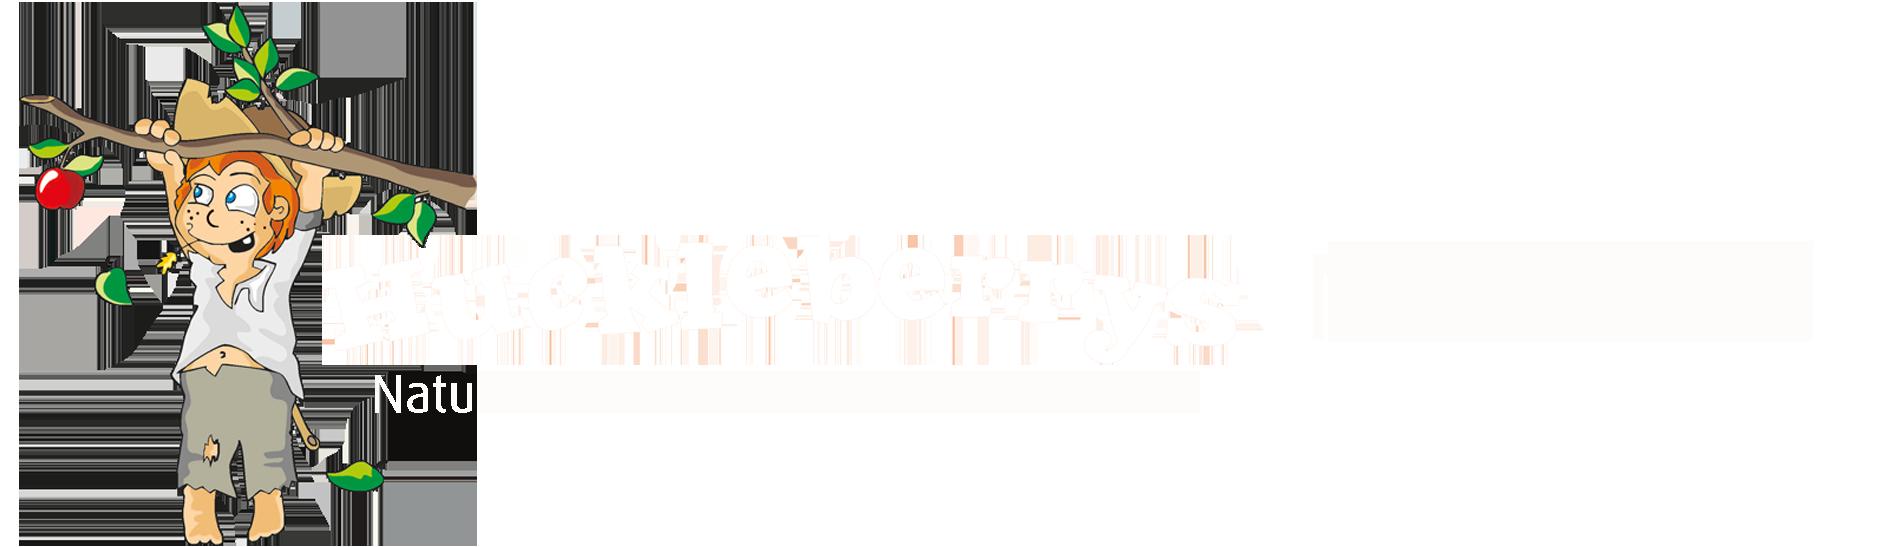 Huckleberrys Naturheld